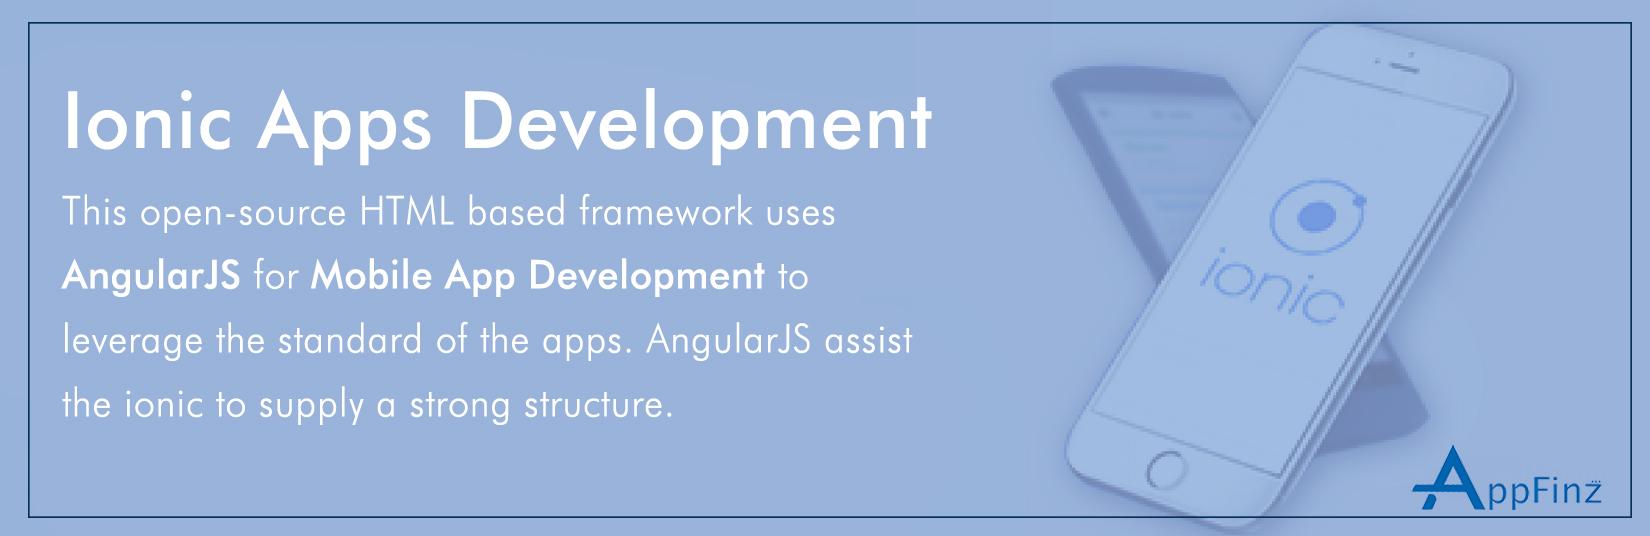 ionic apps development company delhi india